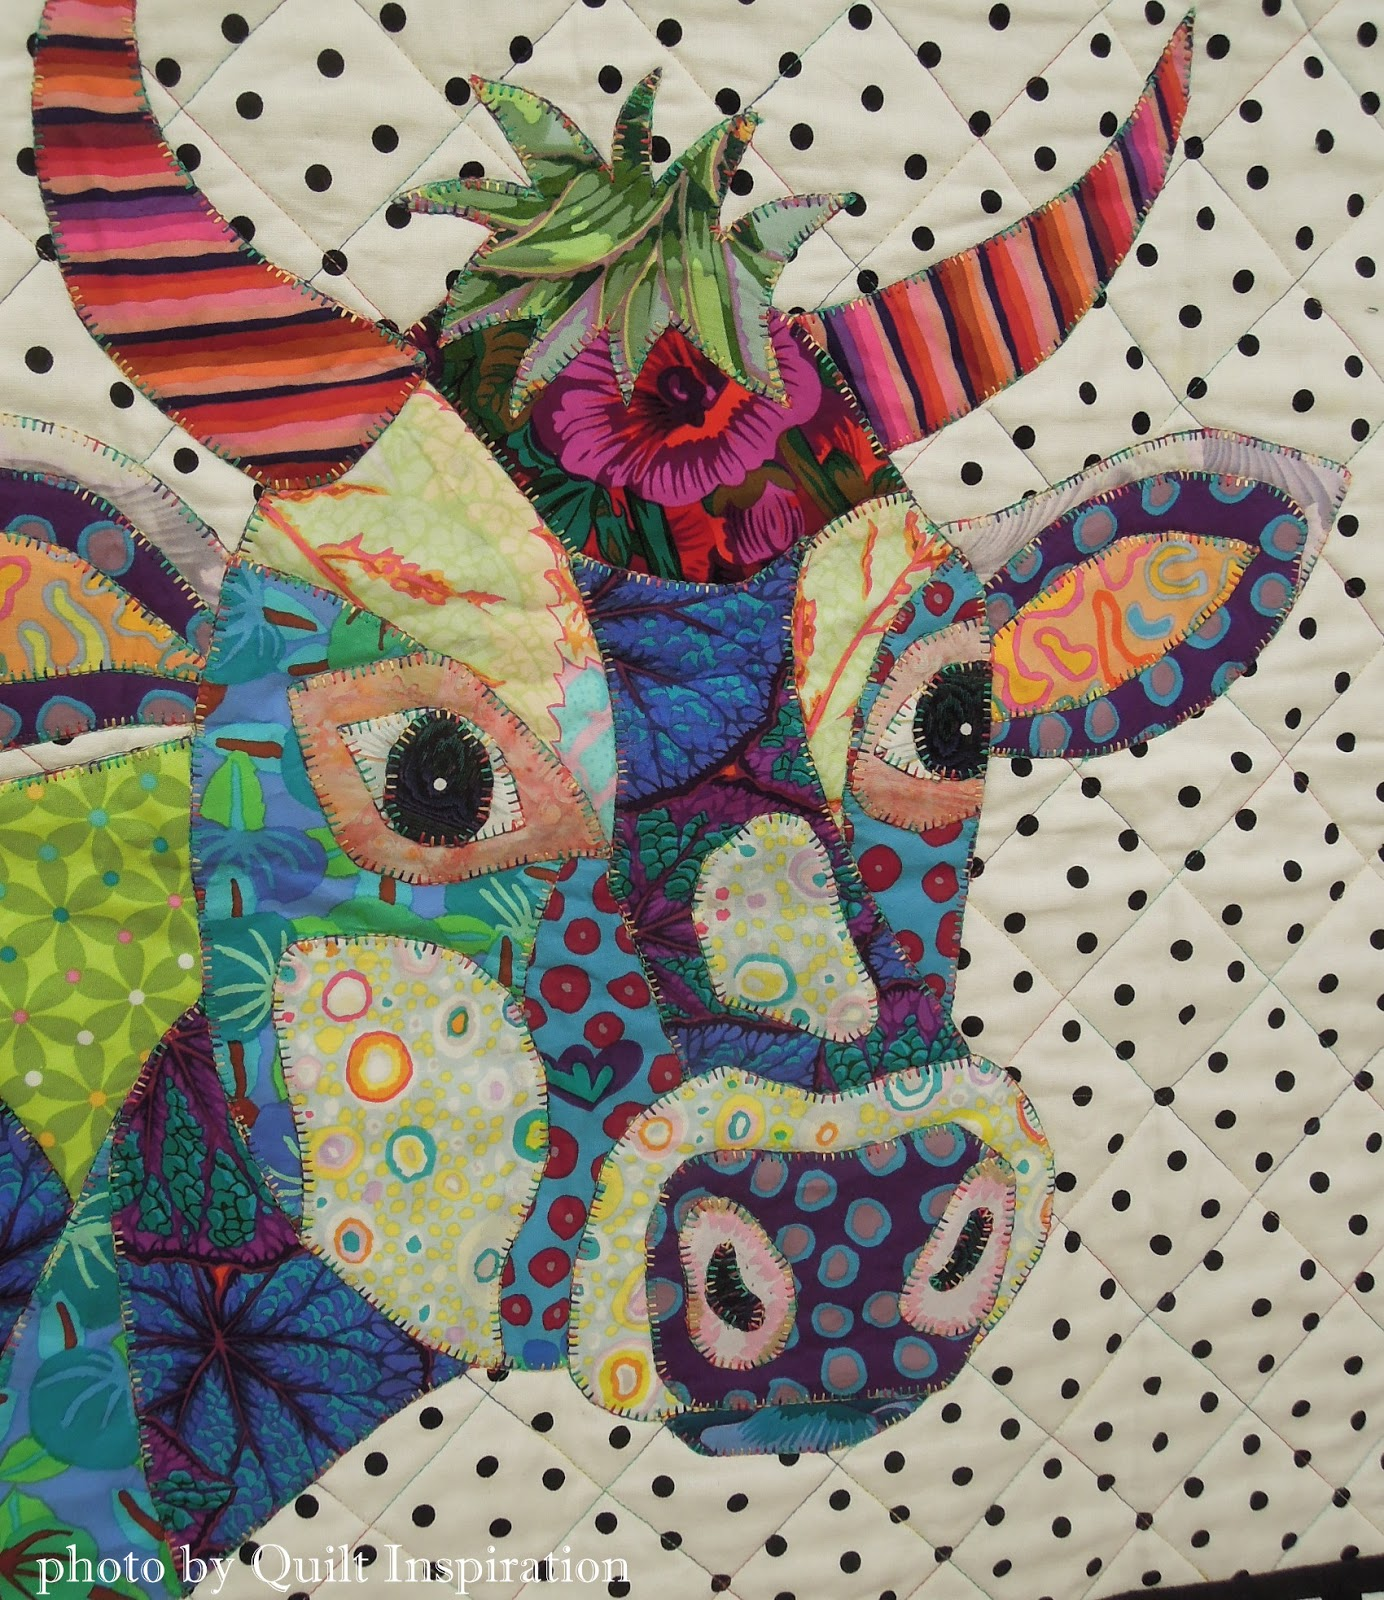 Best of the September quilt show! Day 3 | Quilt Inspiration ... : cow quilt pattern - Adamdwight.com